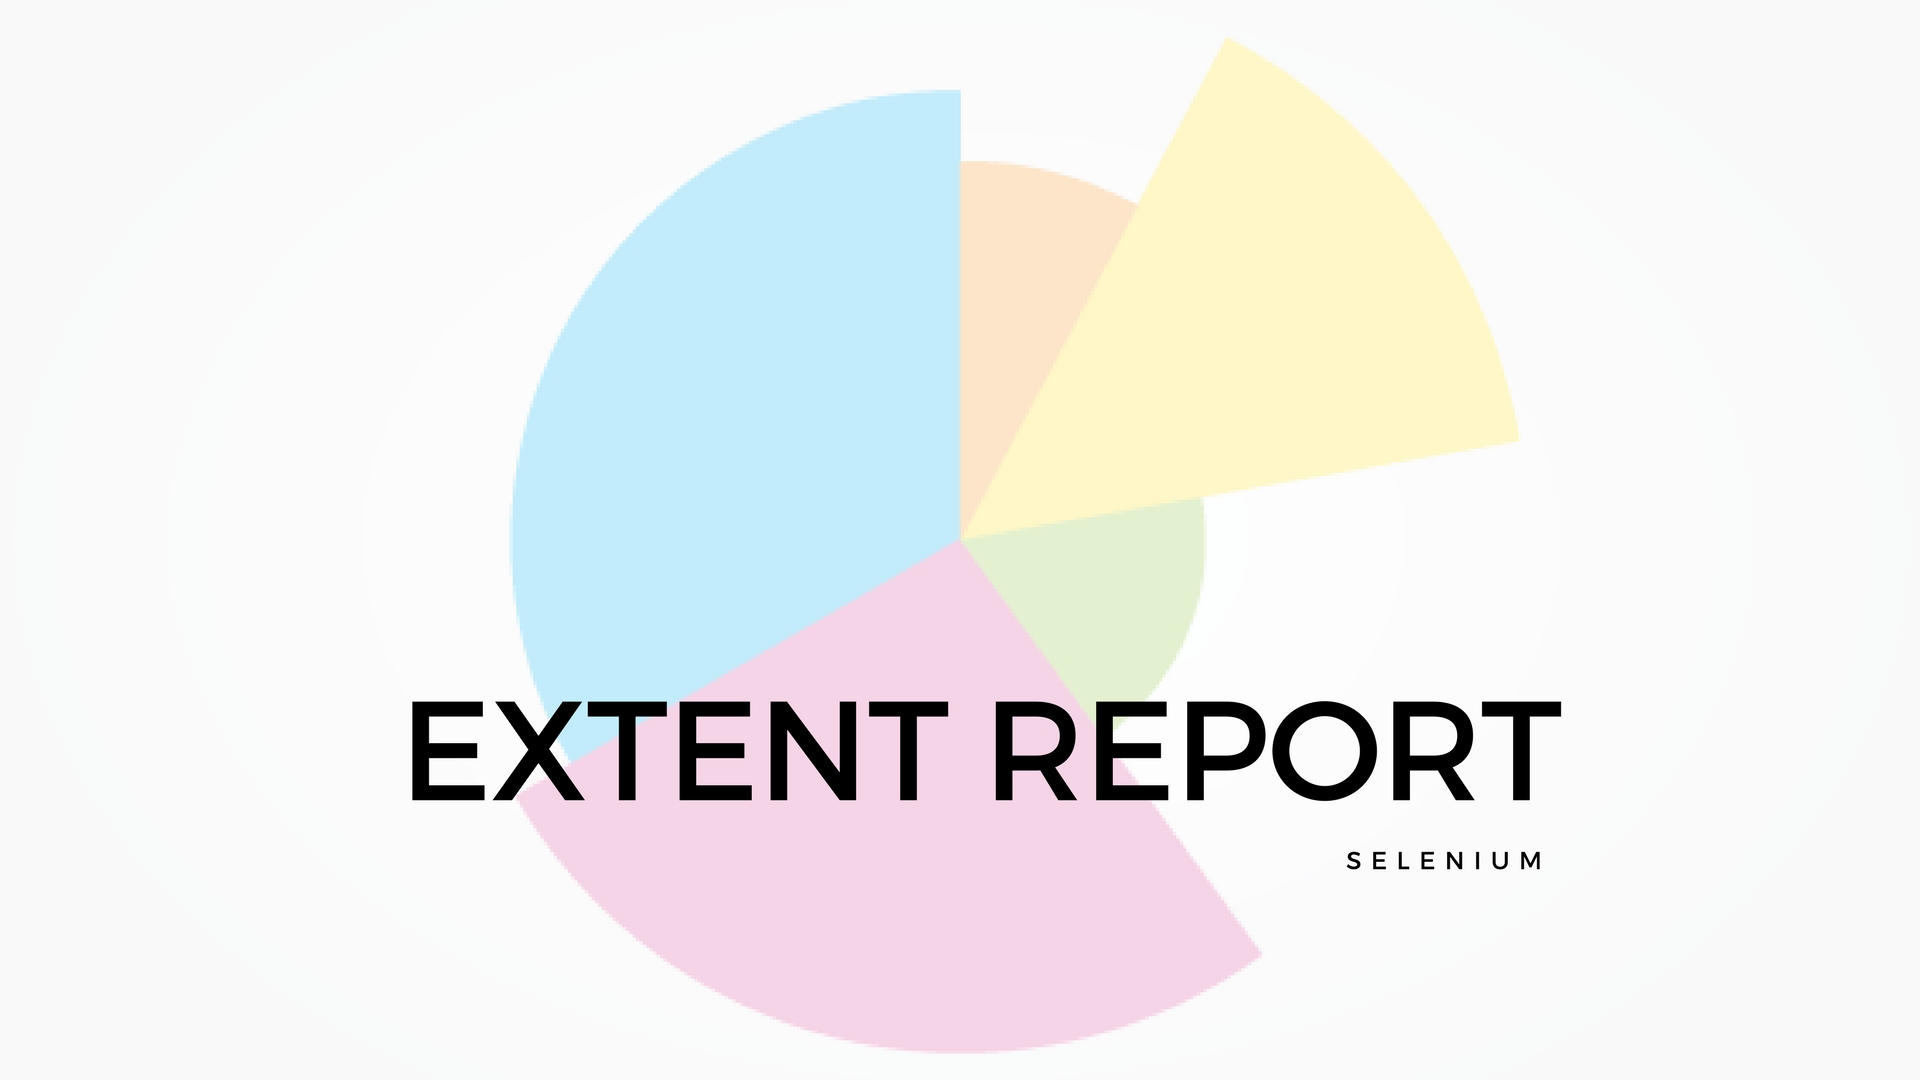 Selenium Reporting Tools | How to Generate Extent Report in